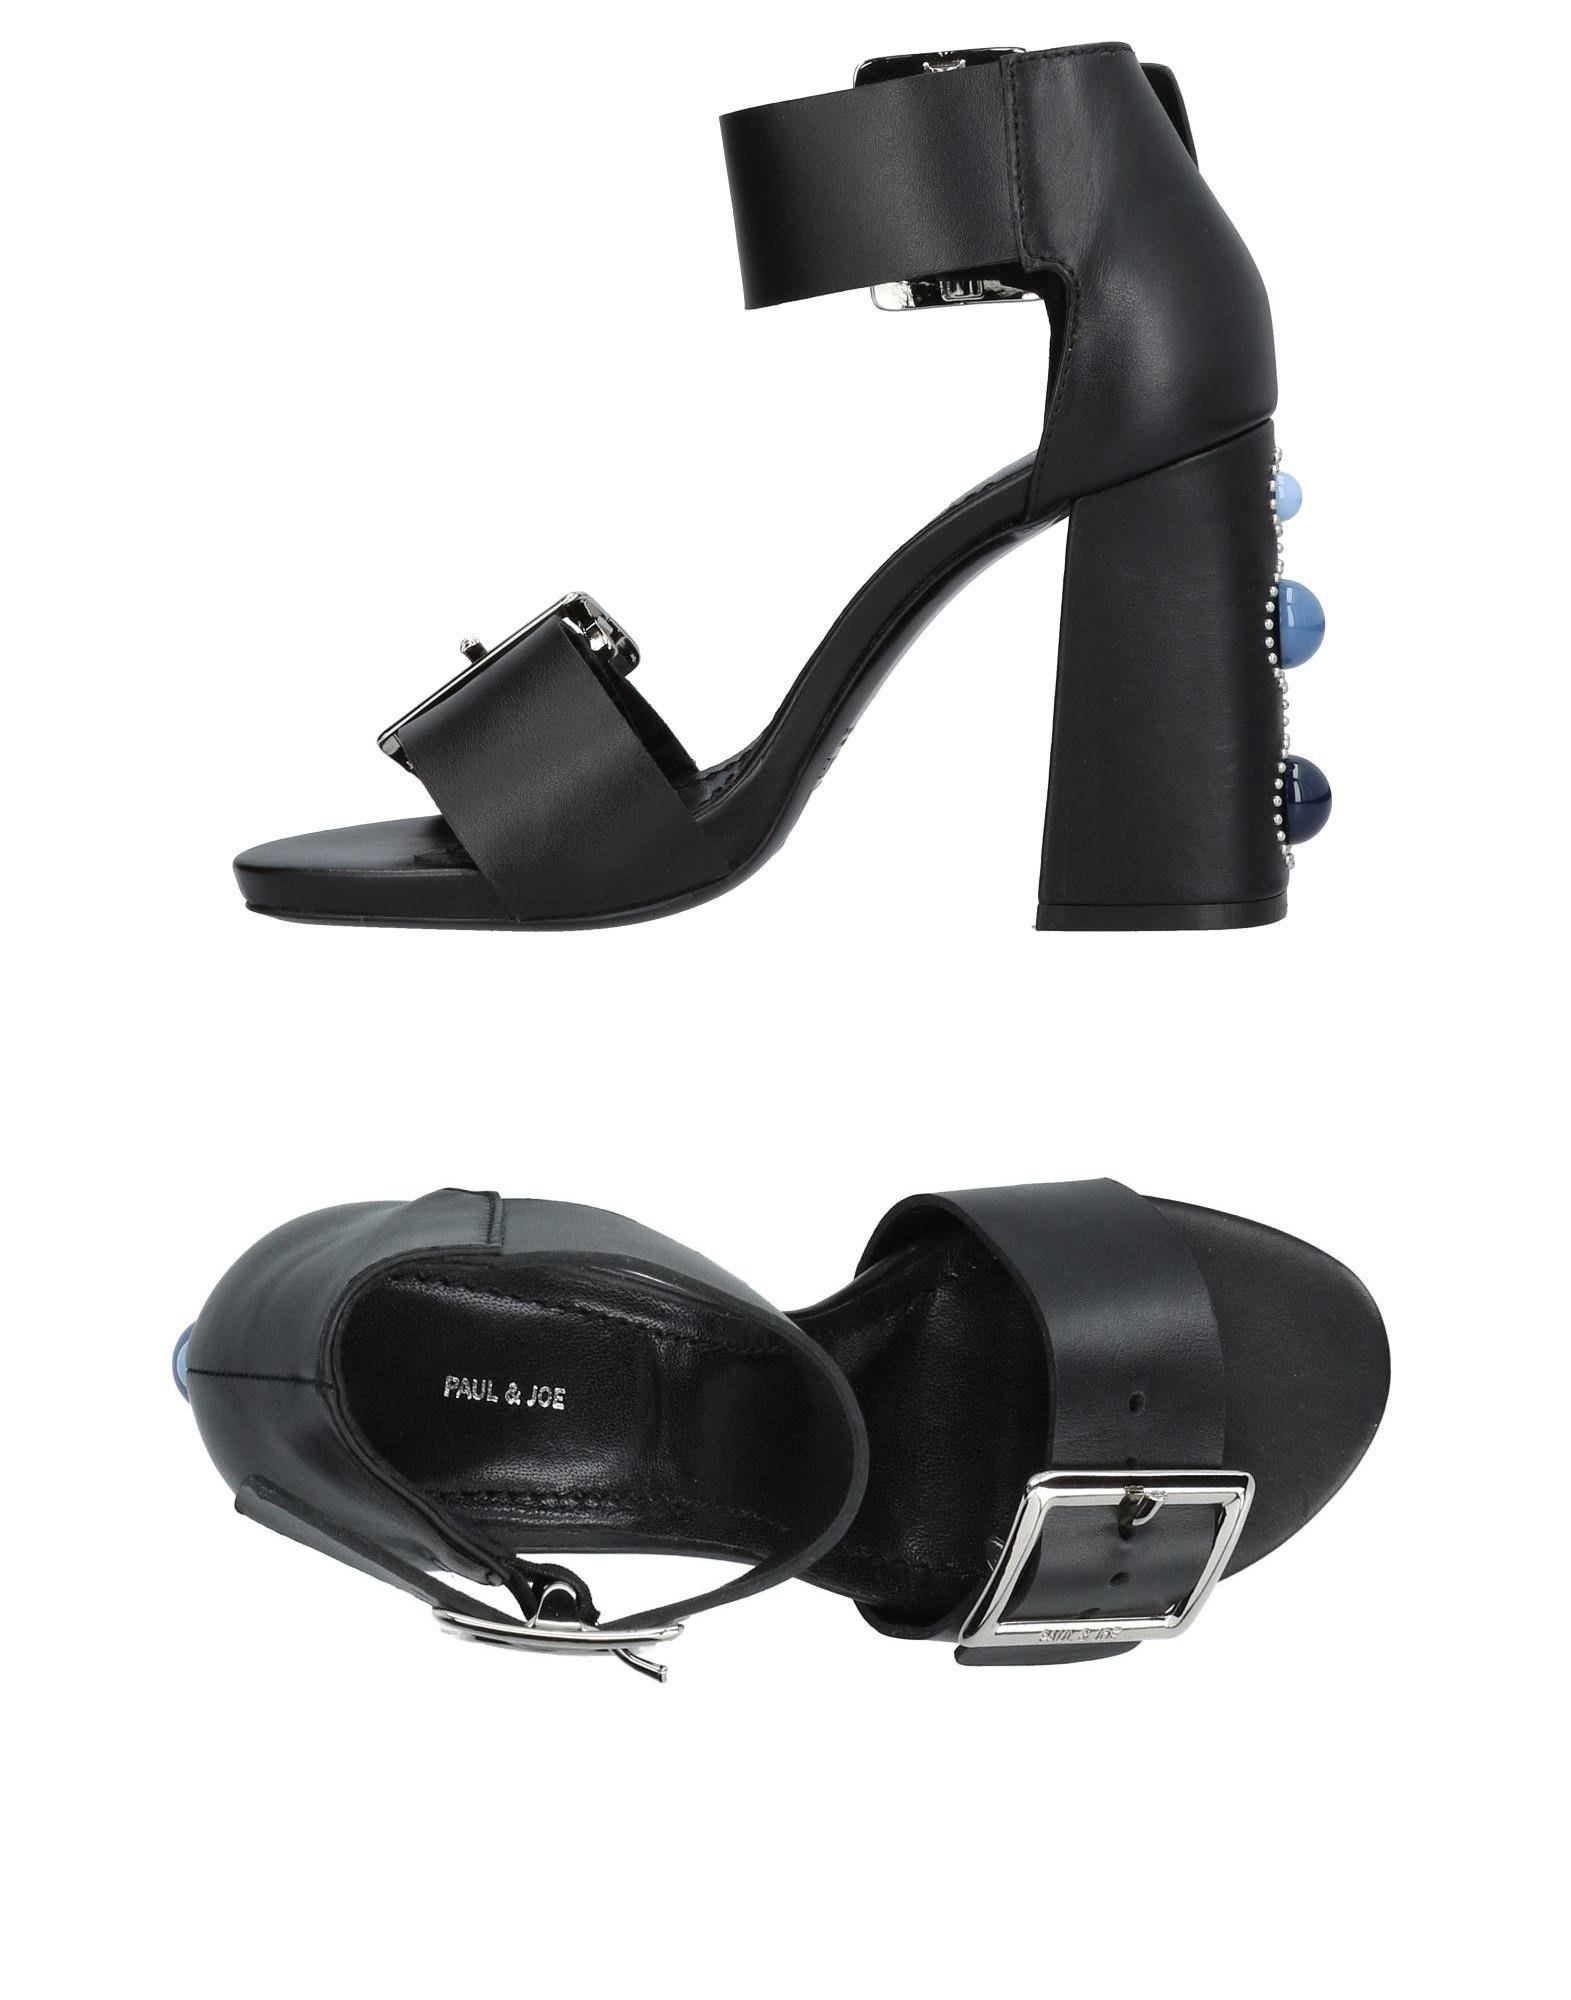 Paul & Joe Sandals In Black